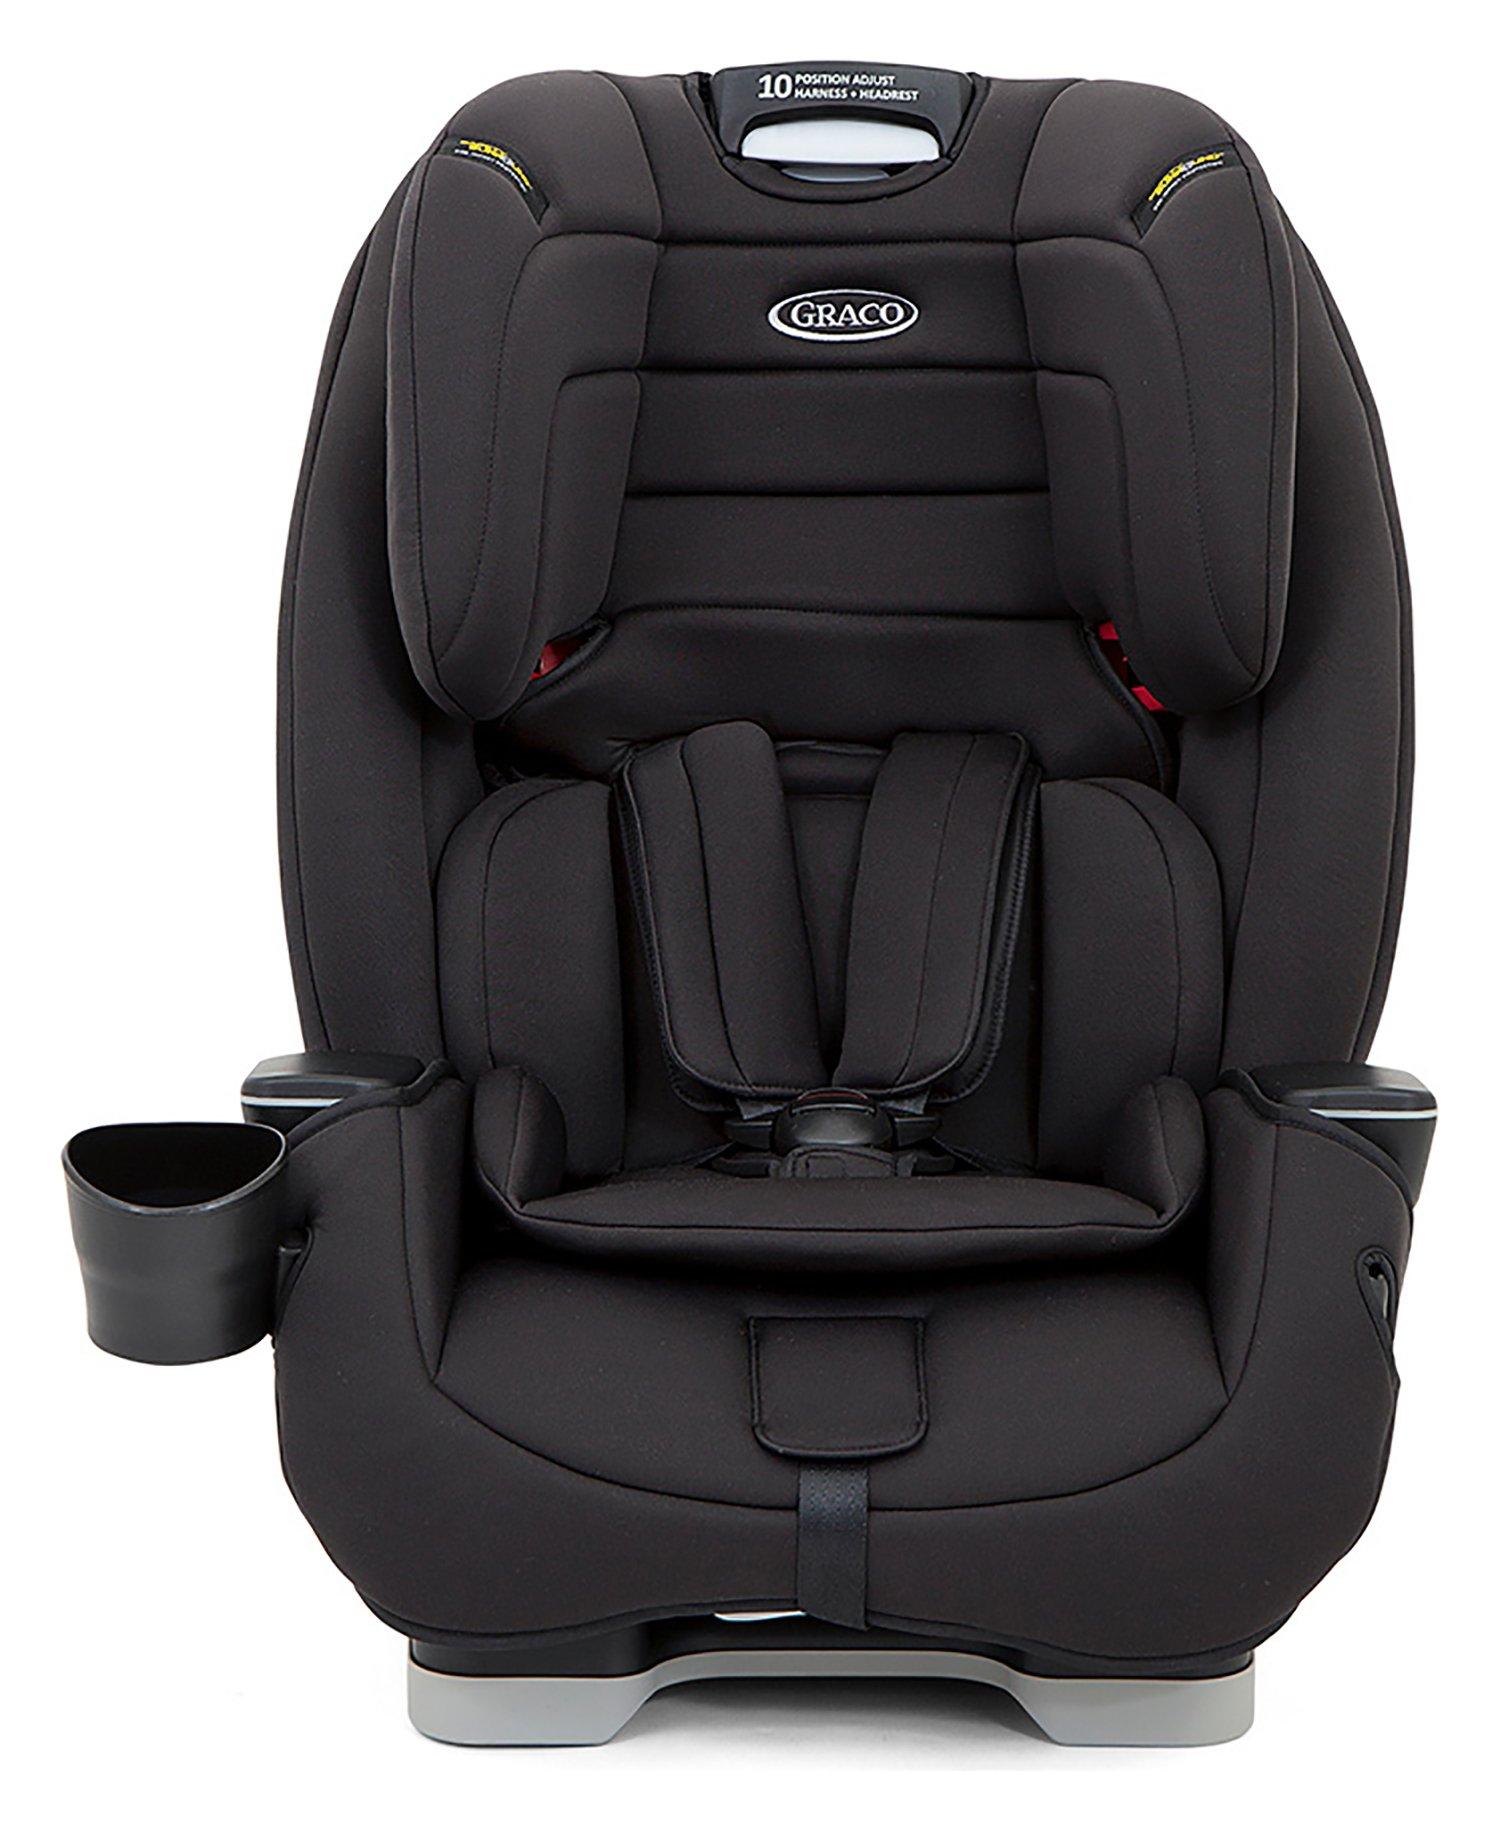 Graco Avolve Group 1/2/3 Car Seat